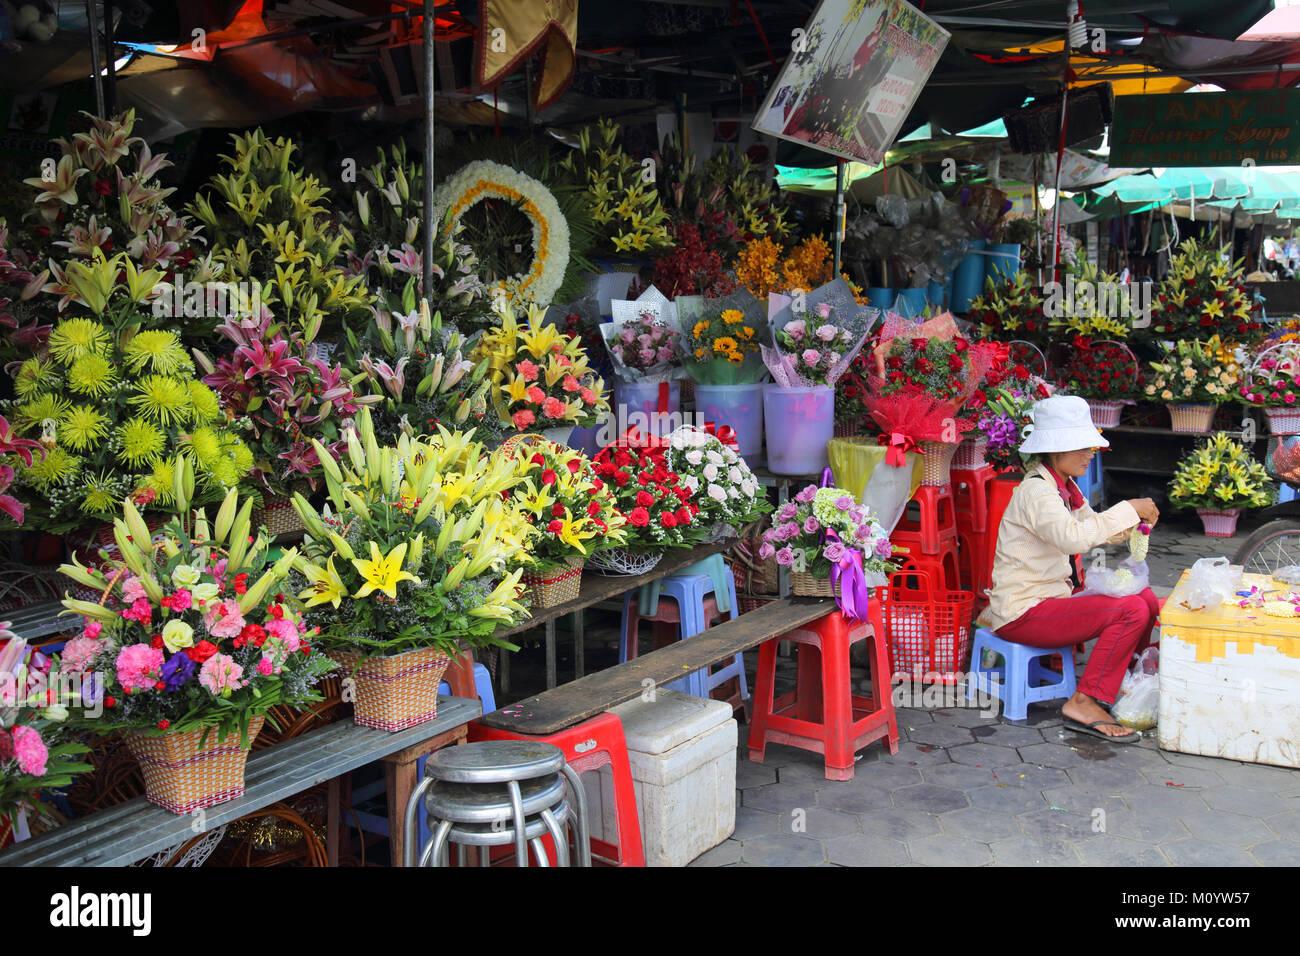 flower seller in the central market phnom penh cambodia Stock Photo